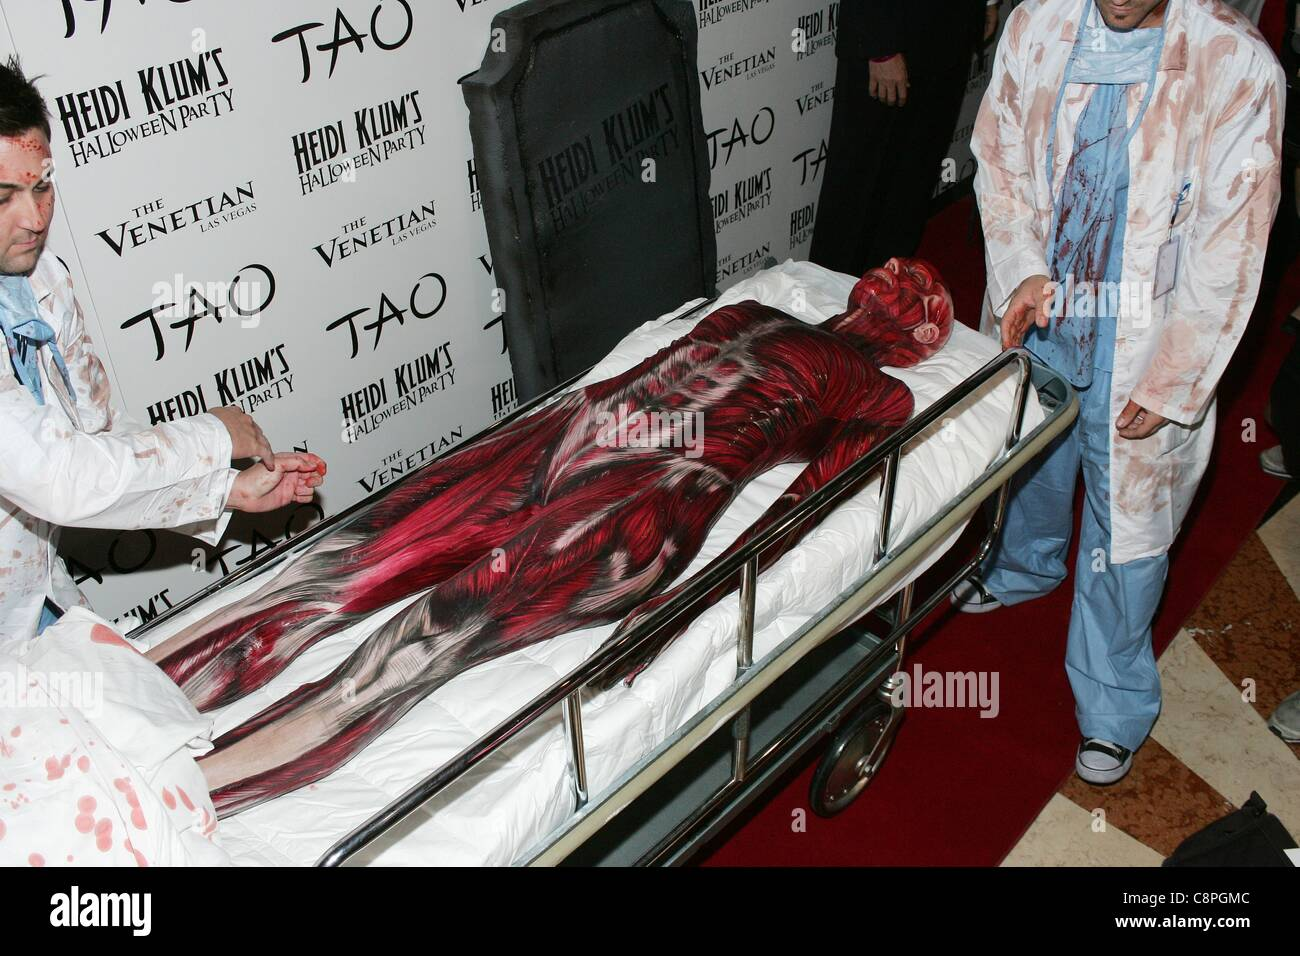 Heidi Klum in attendance for Heidi Klum Halloween Party at TAO ...